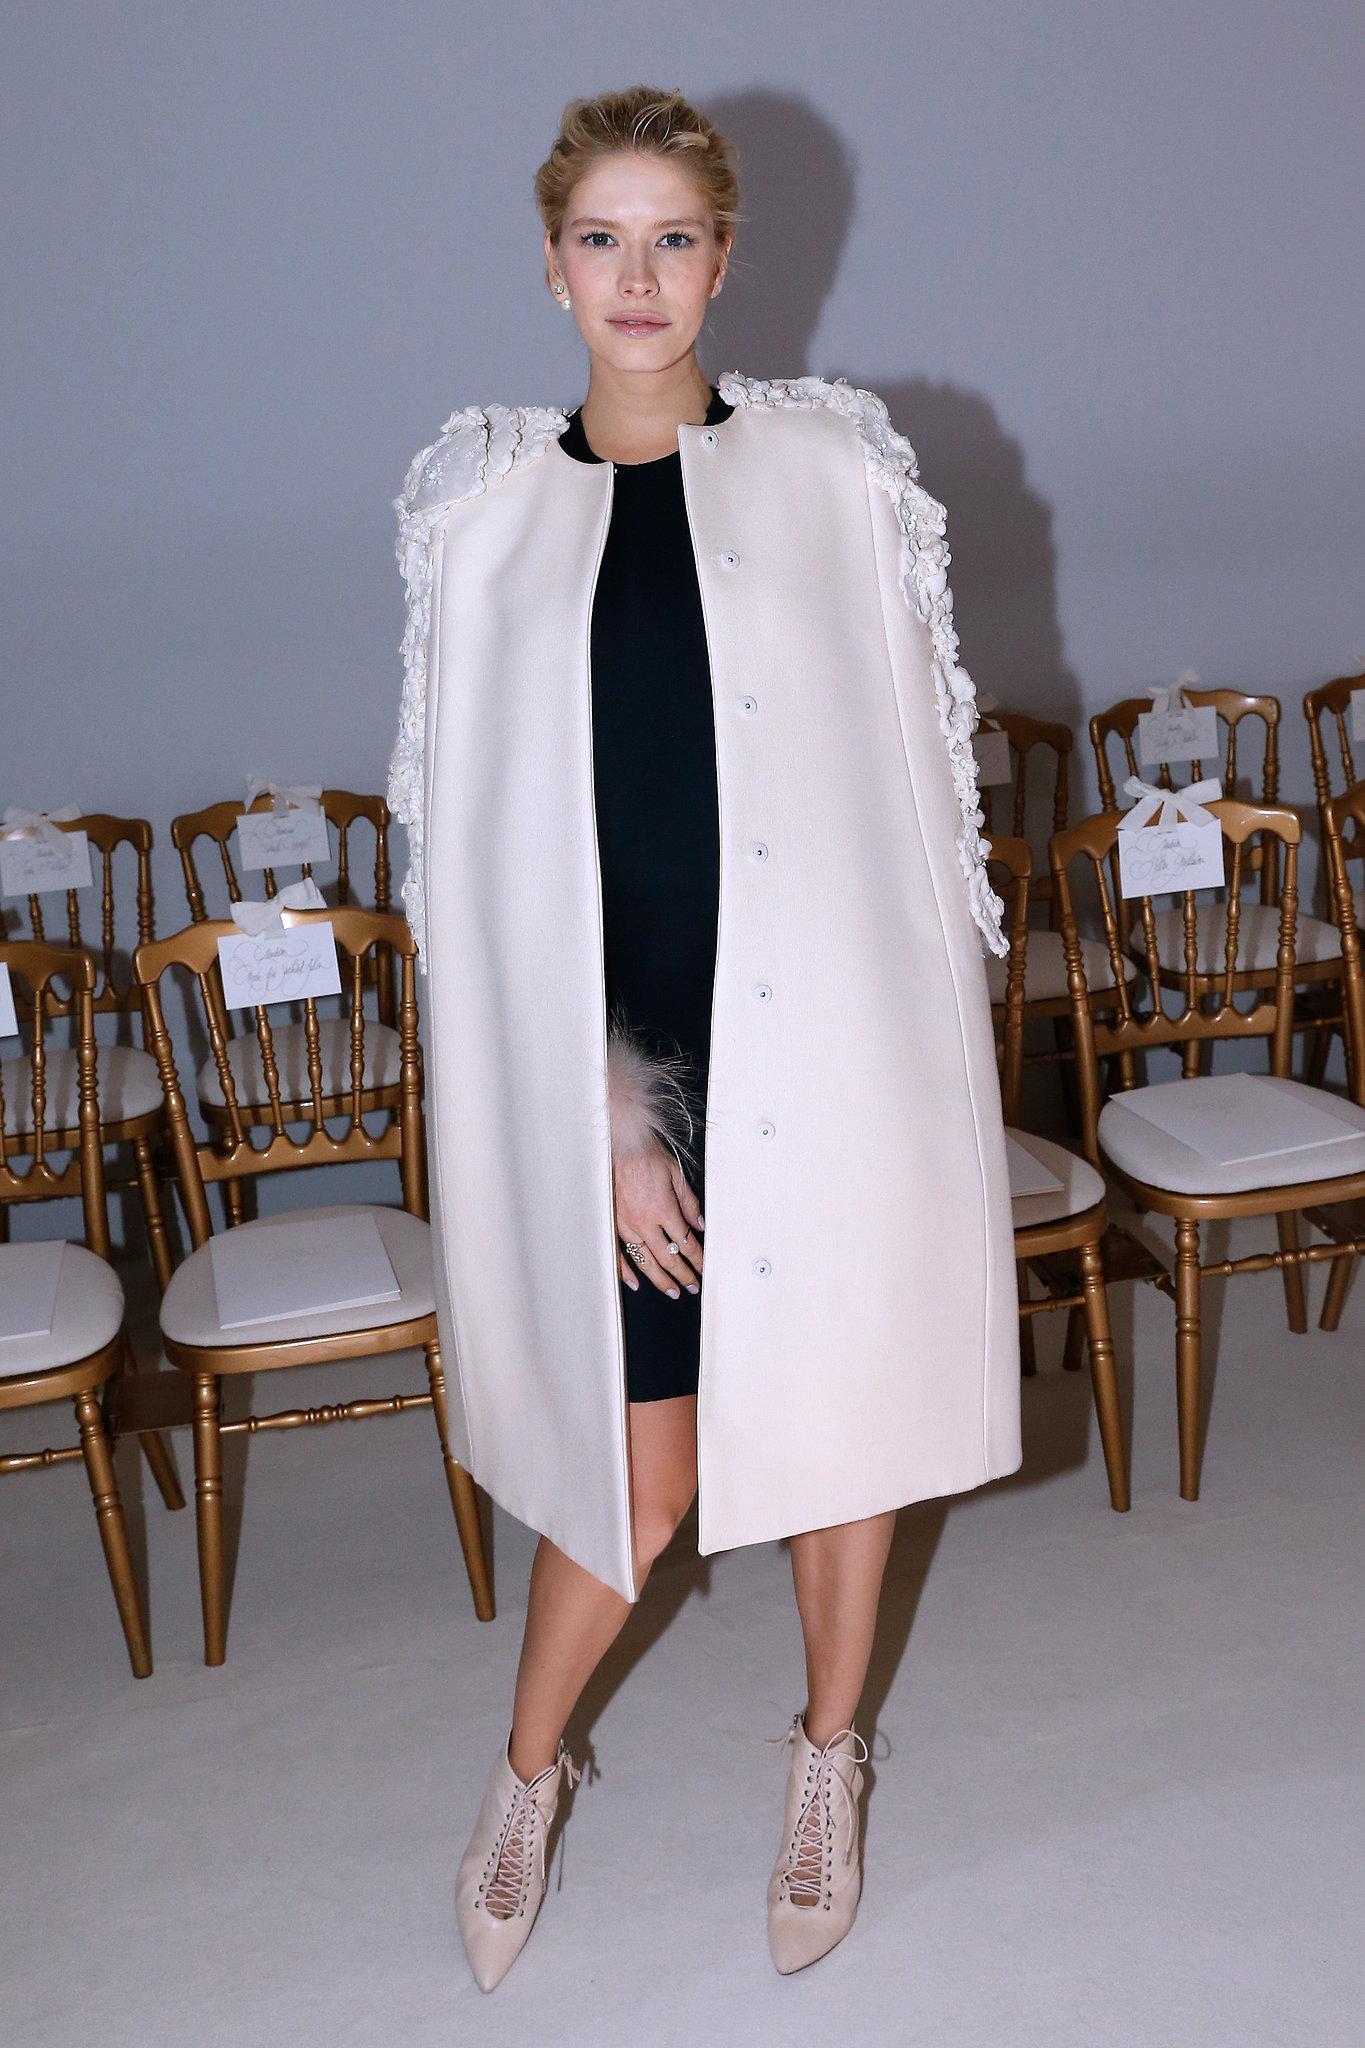 Elena Perminova at the Giambattista Valli Paris Haute Couture show.